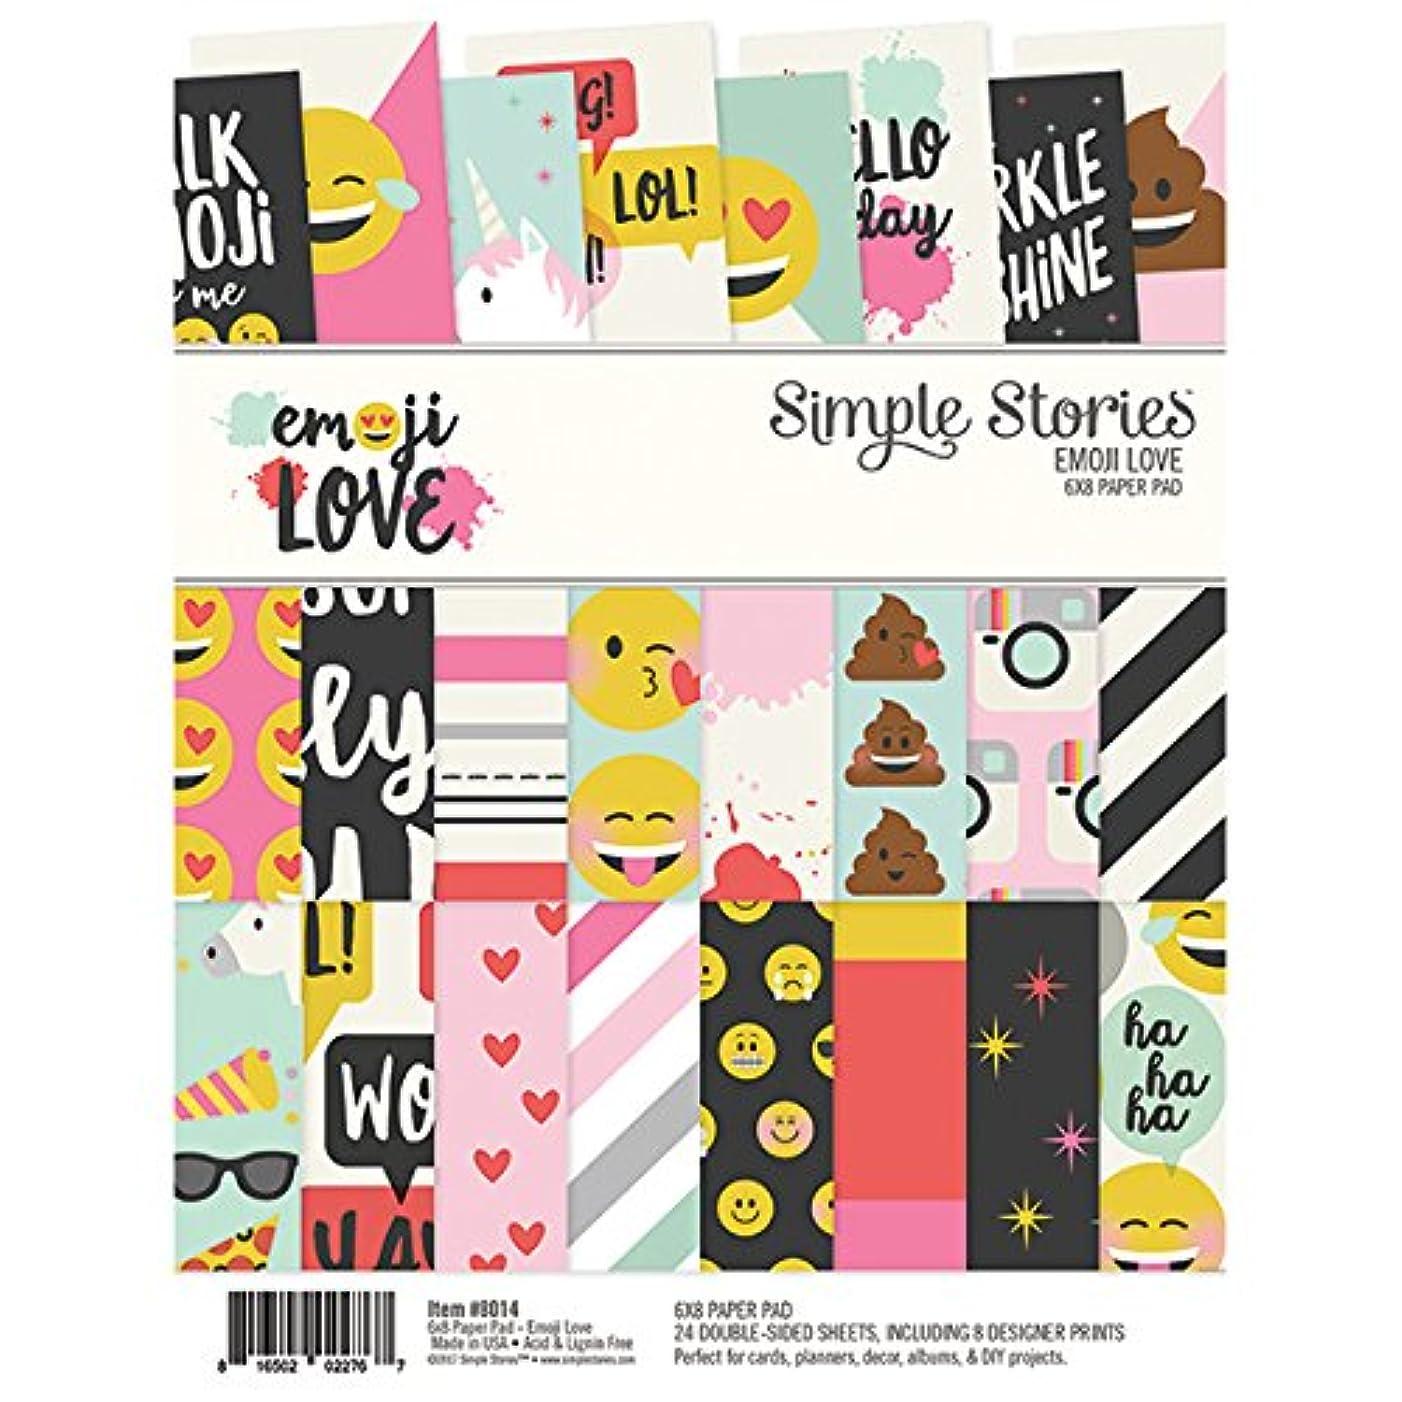 Simple Stories Emoji Love 6x8 Paper Pad